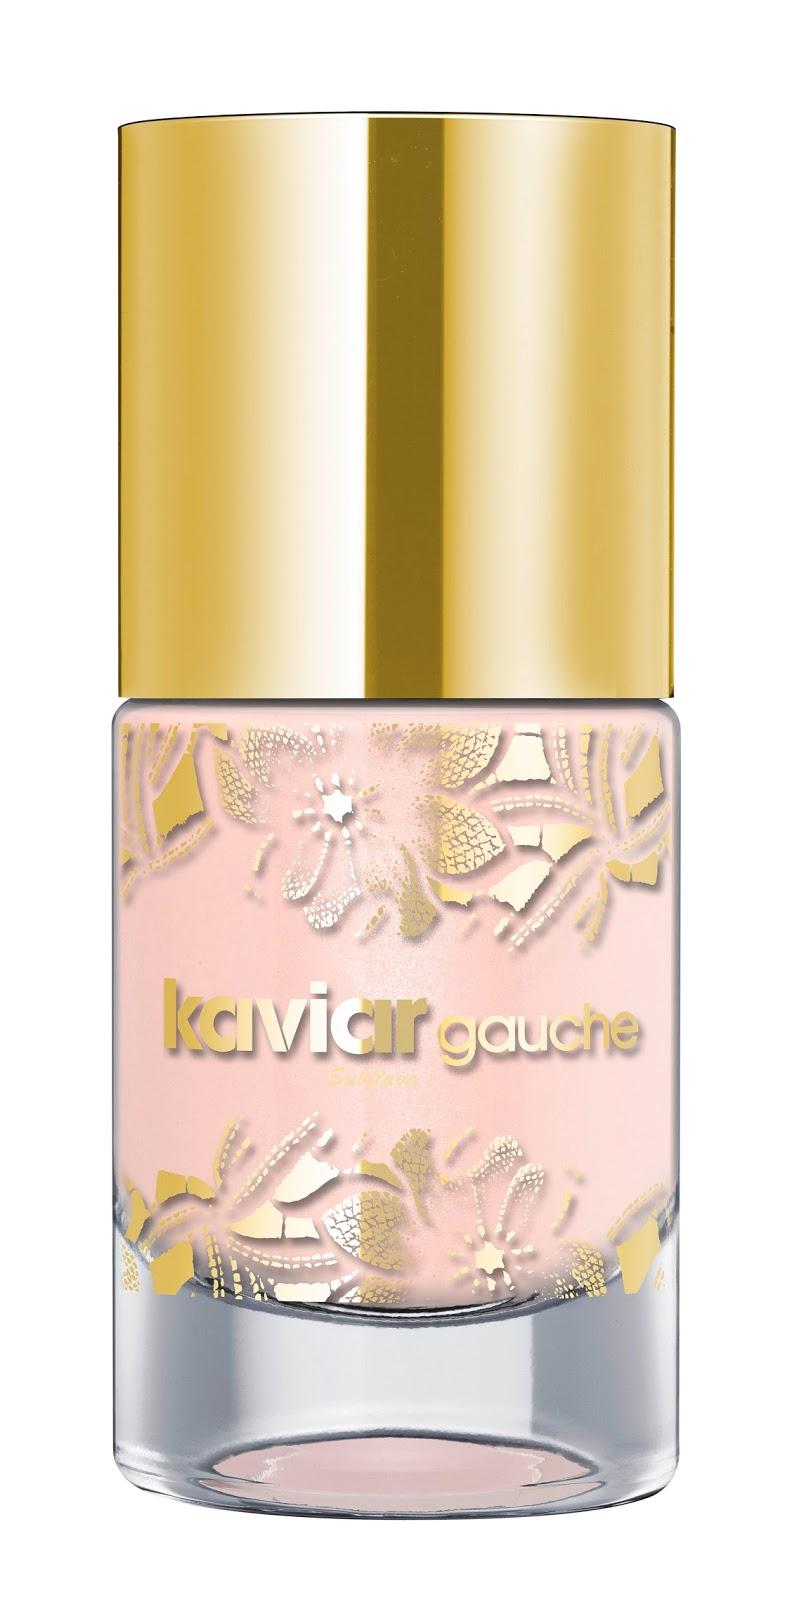 kaviar-gauche-catrice